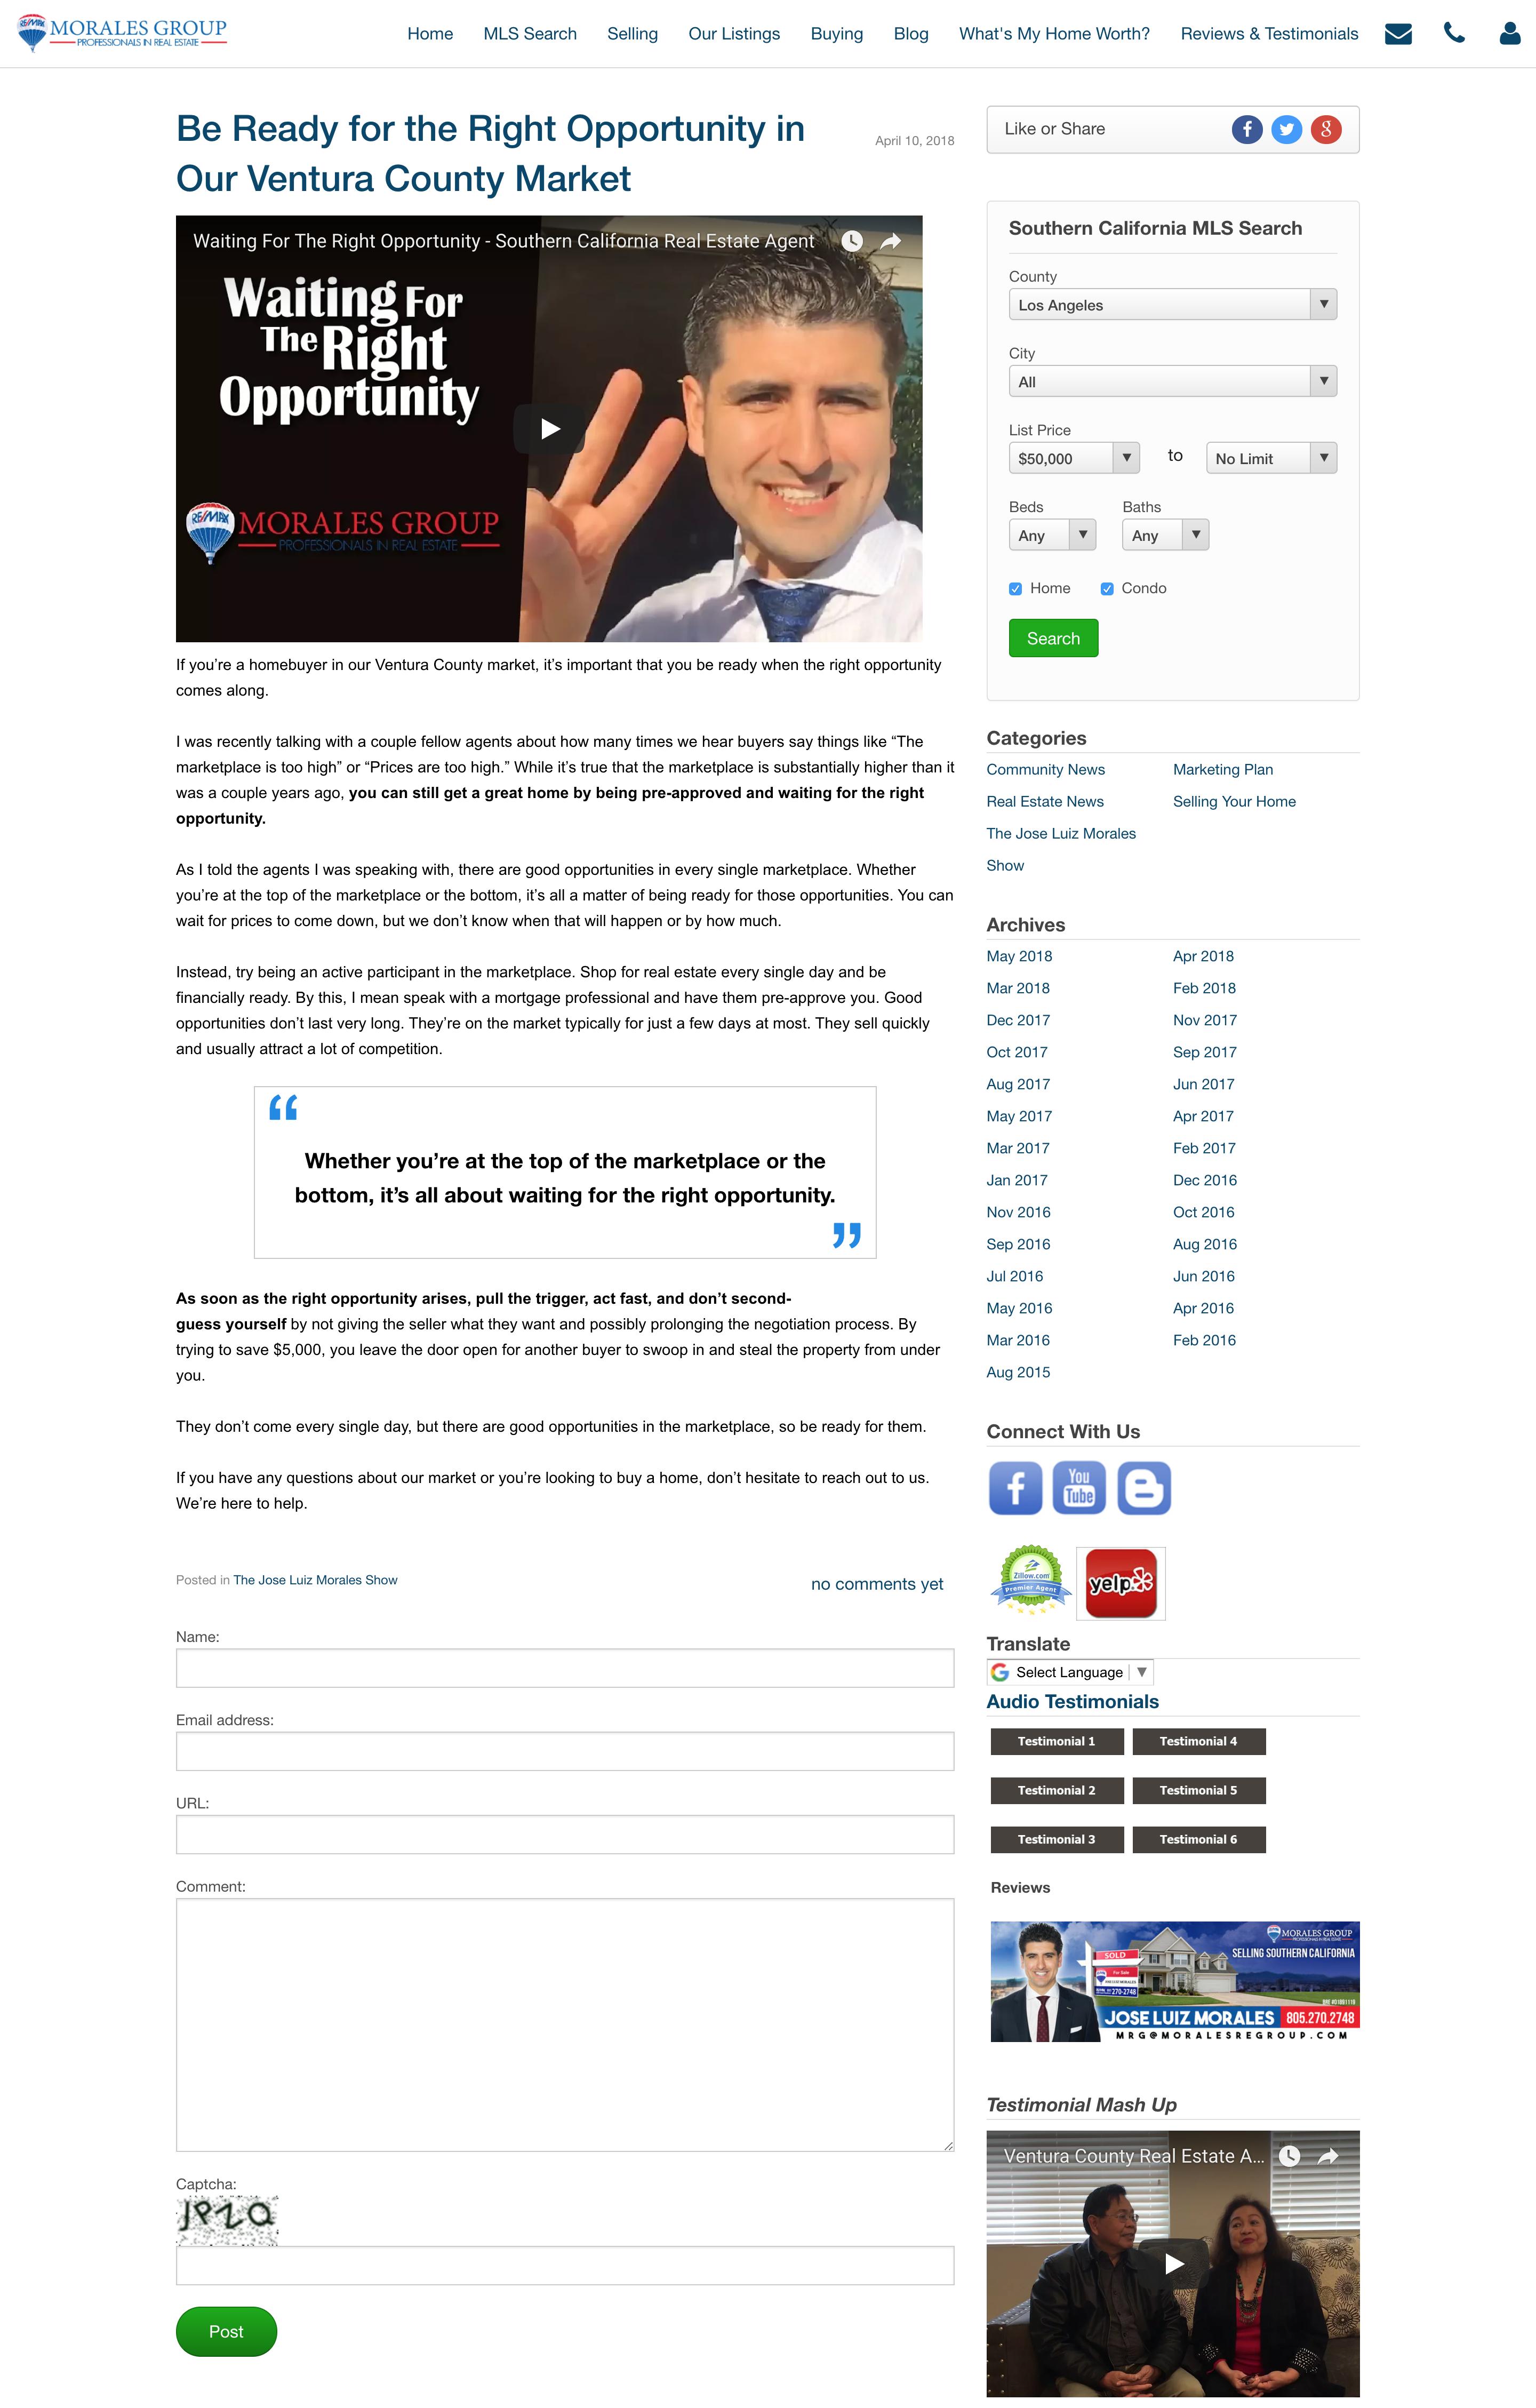 Jose-Morales-Blog-Post